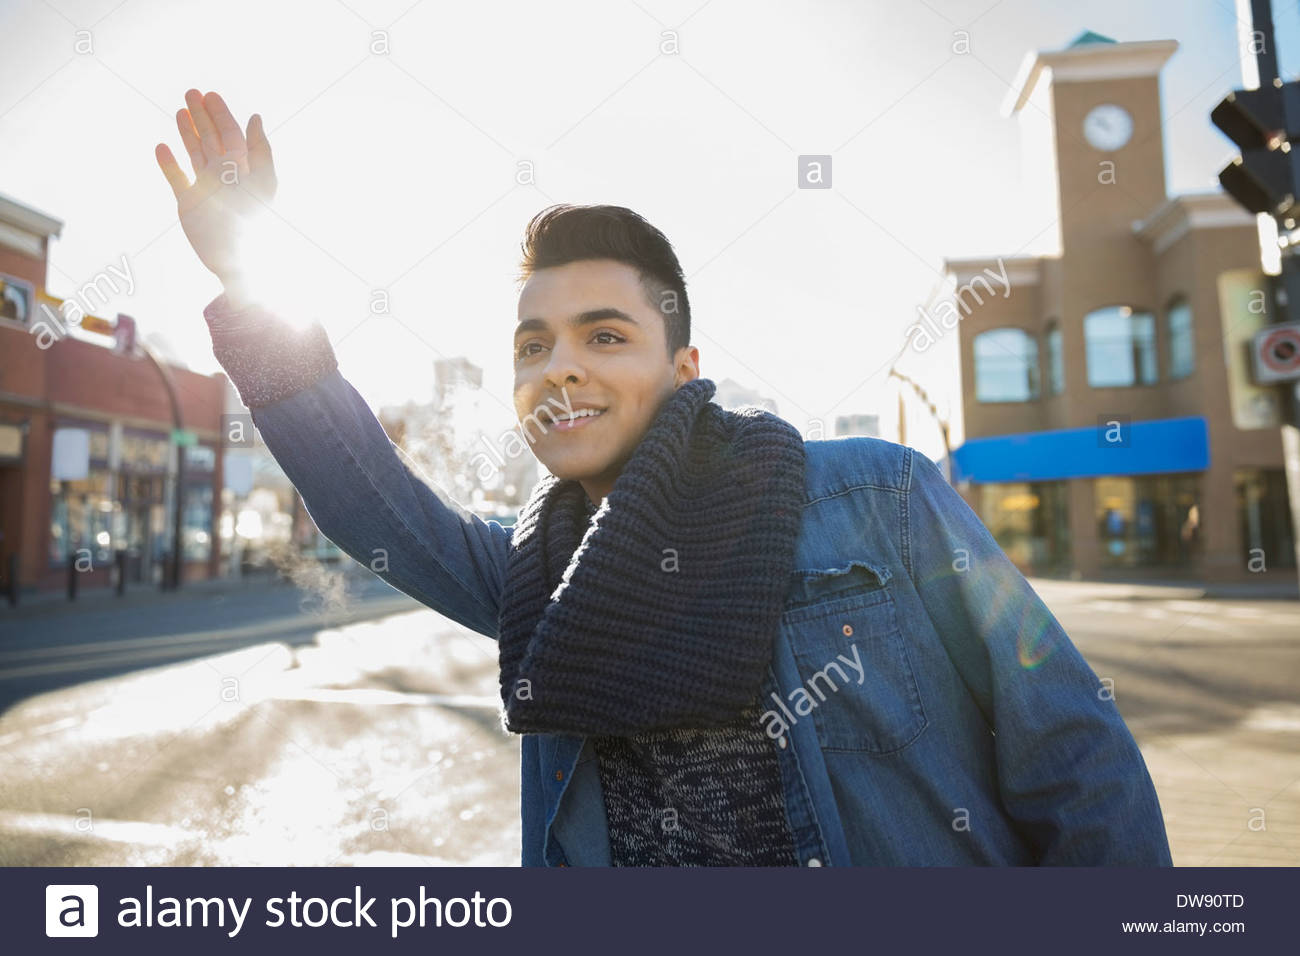 Man hailing taxi on city street - Stock Image